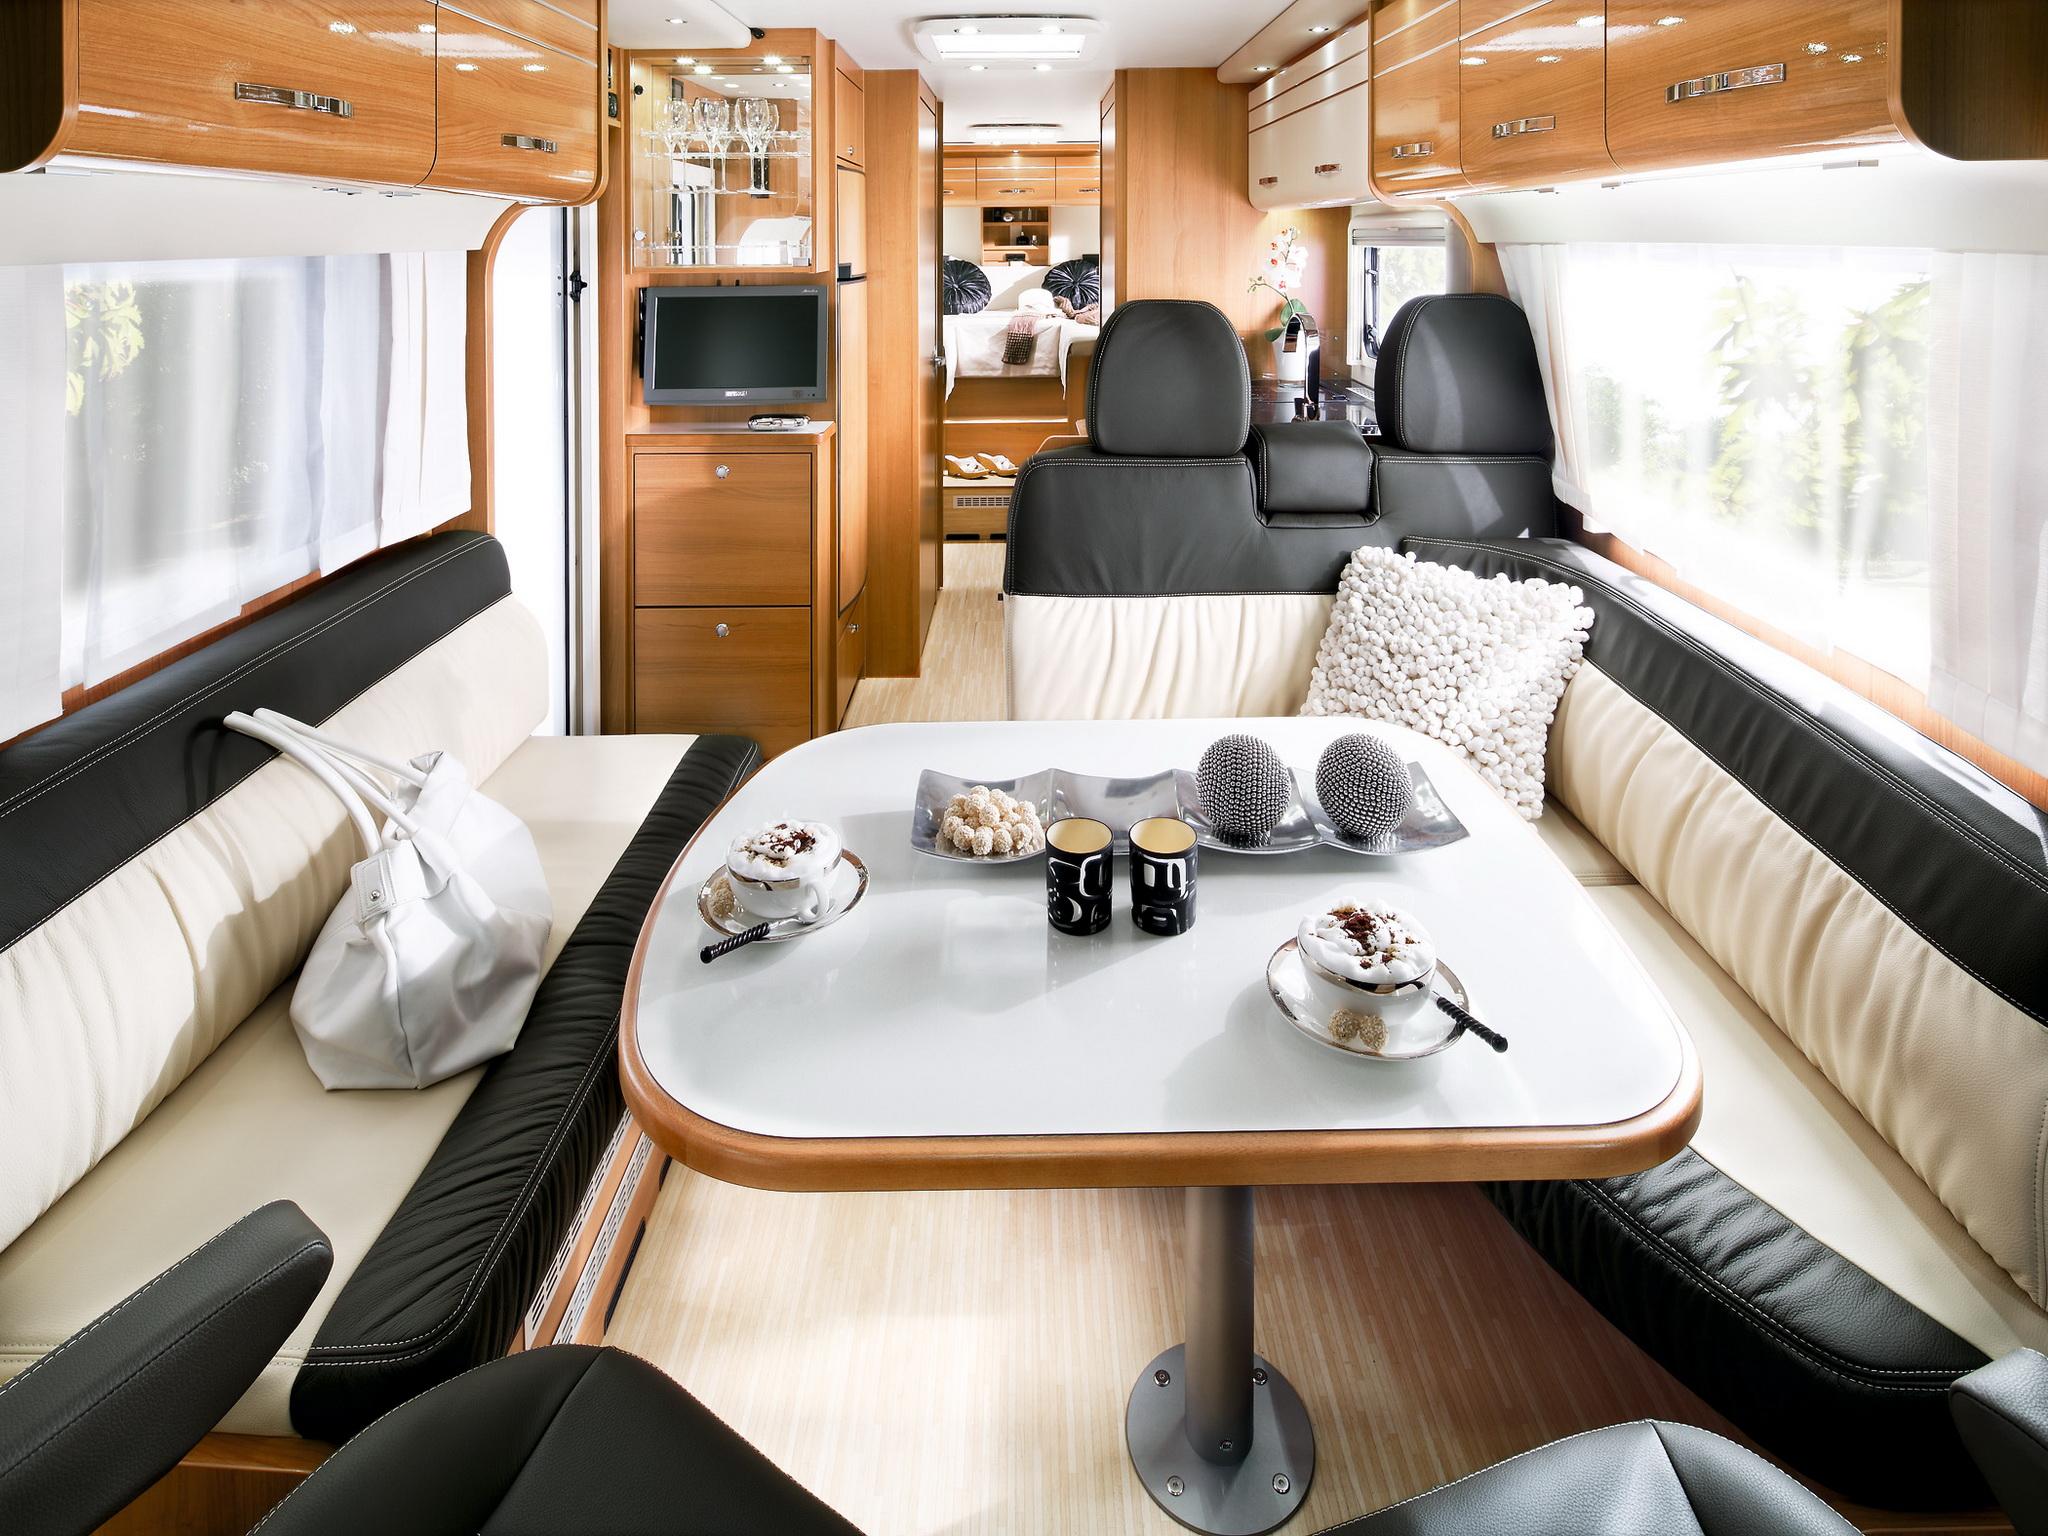 2013 Lmc Grand Explorer Motorhome Camper Interior H